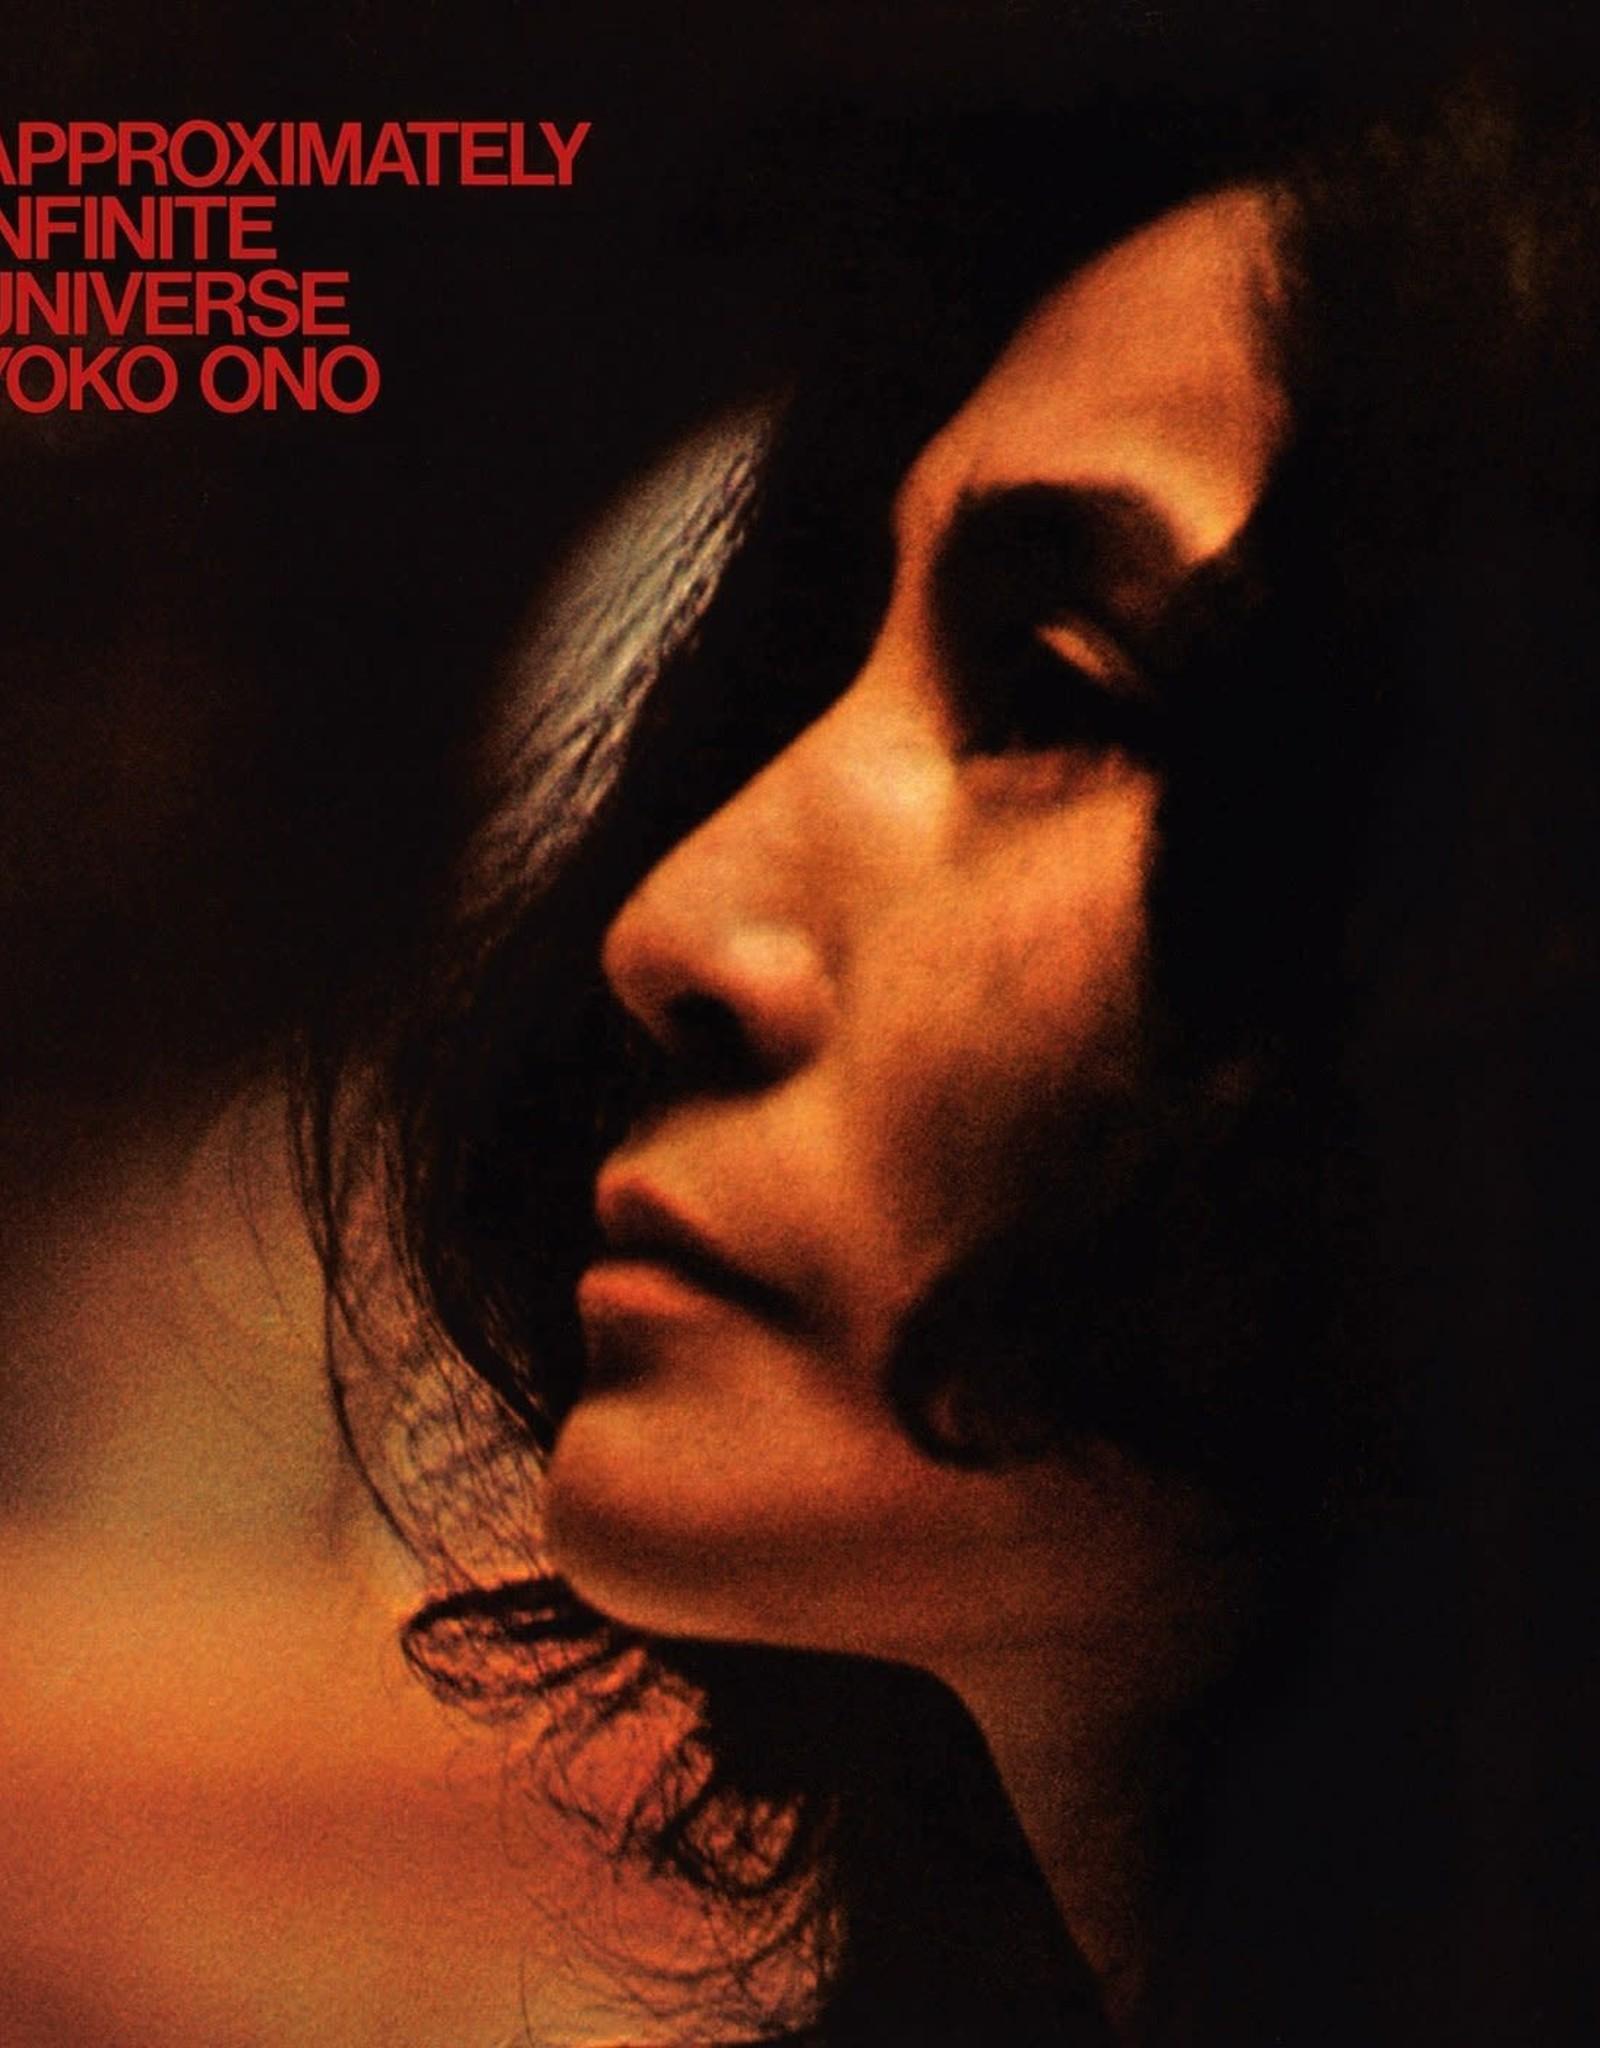 Yoko Ono - Approximately Infinite Universe (2Lp)